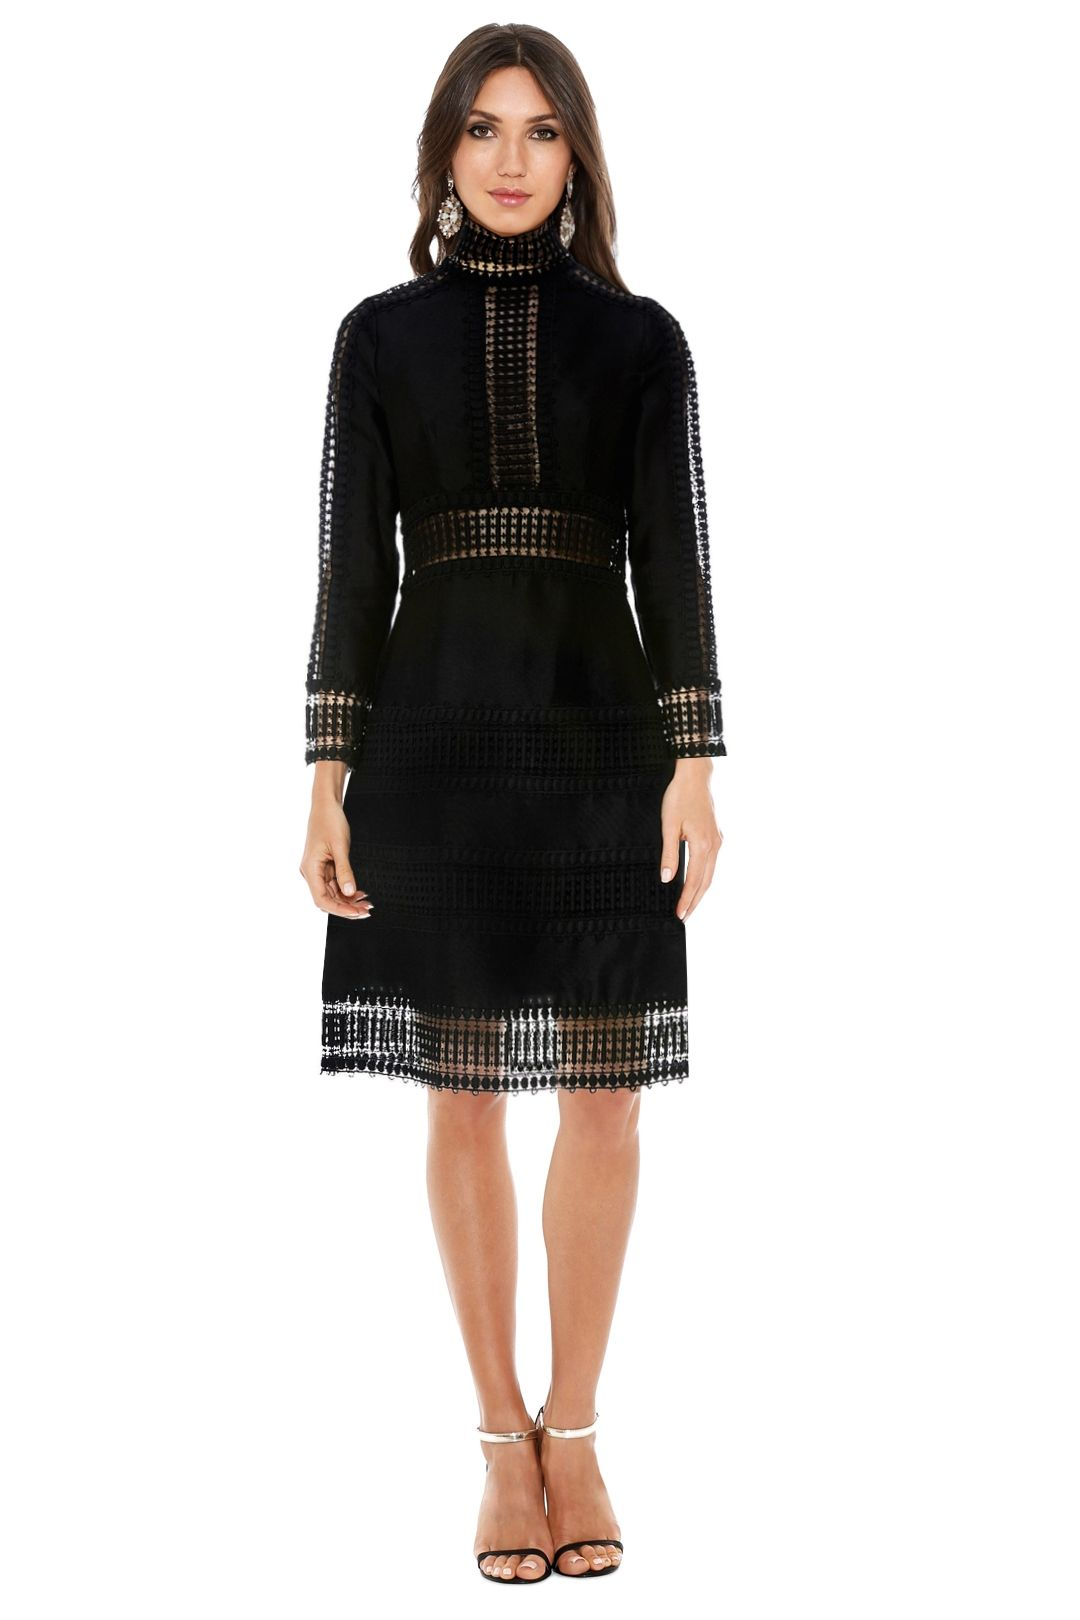 Thurley - Salvadore Mini Dress - Black - Front